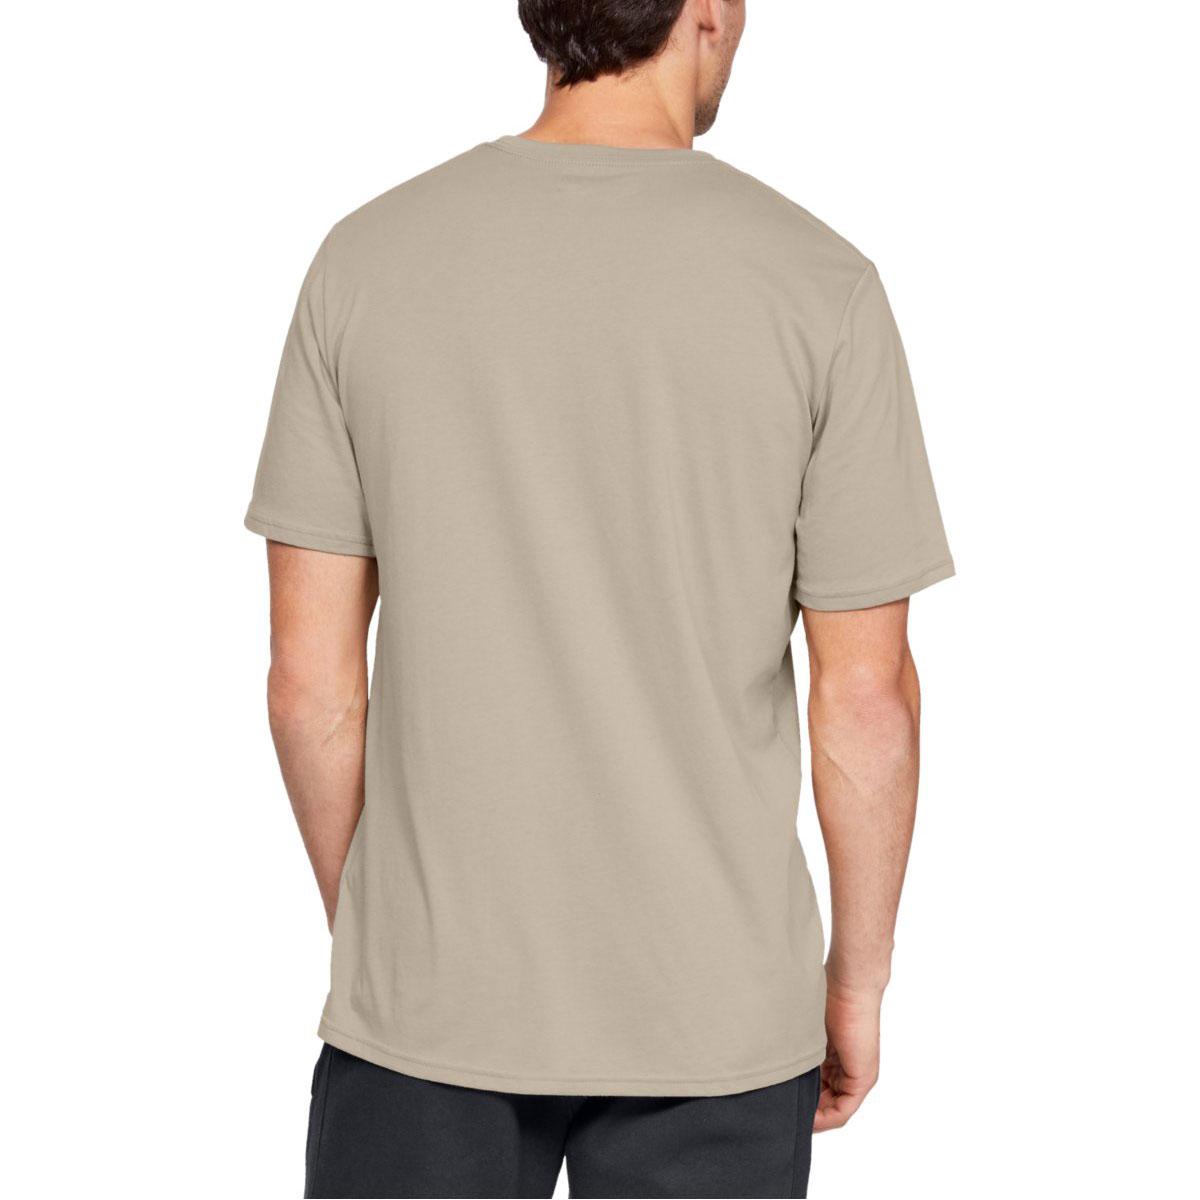 Under-Armour-Mens-2019-UA-GL-Foundation-T-Shirt thumbnail 9